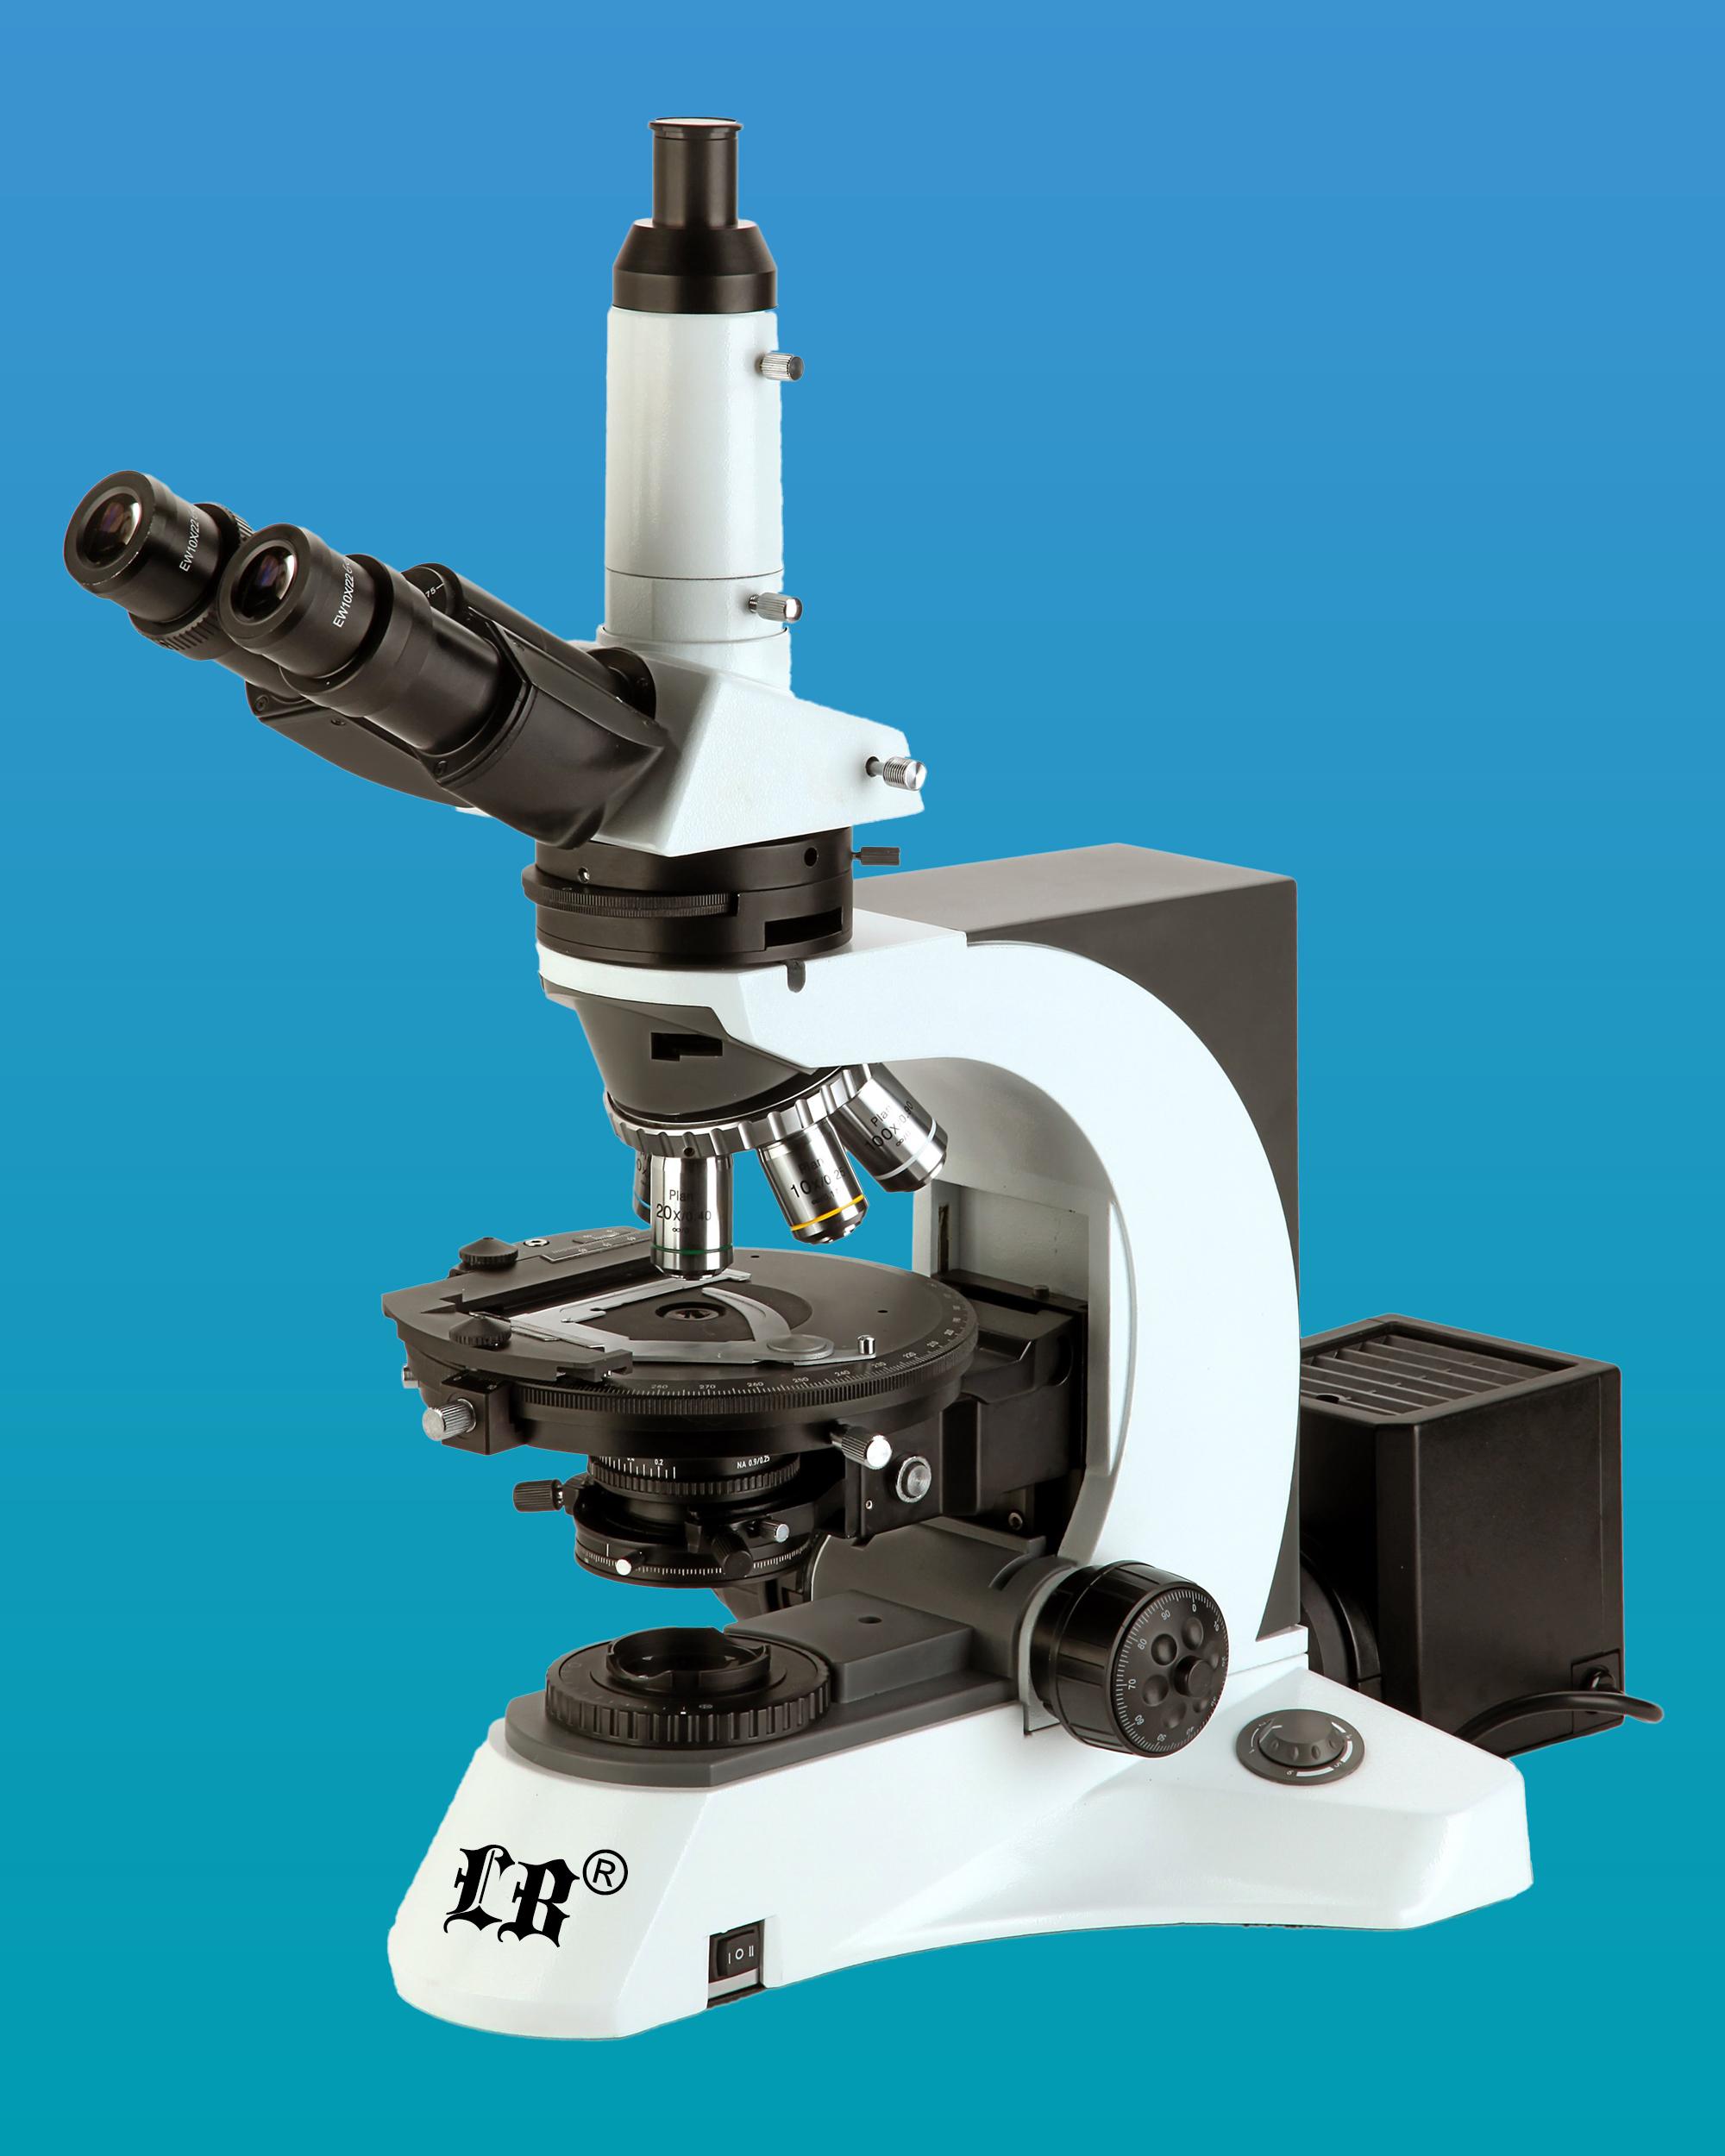 [LB-592] Polarizing Trinocular Microscope w/ Infinite Optical System